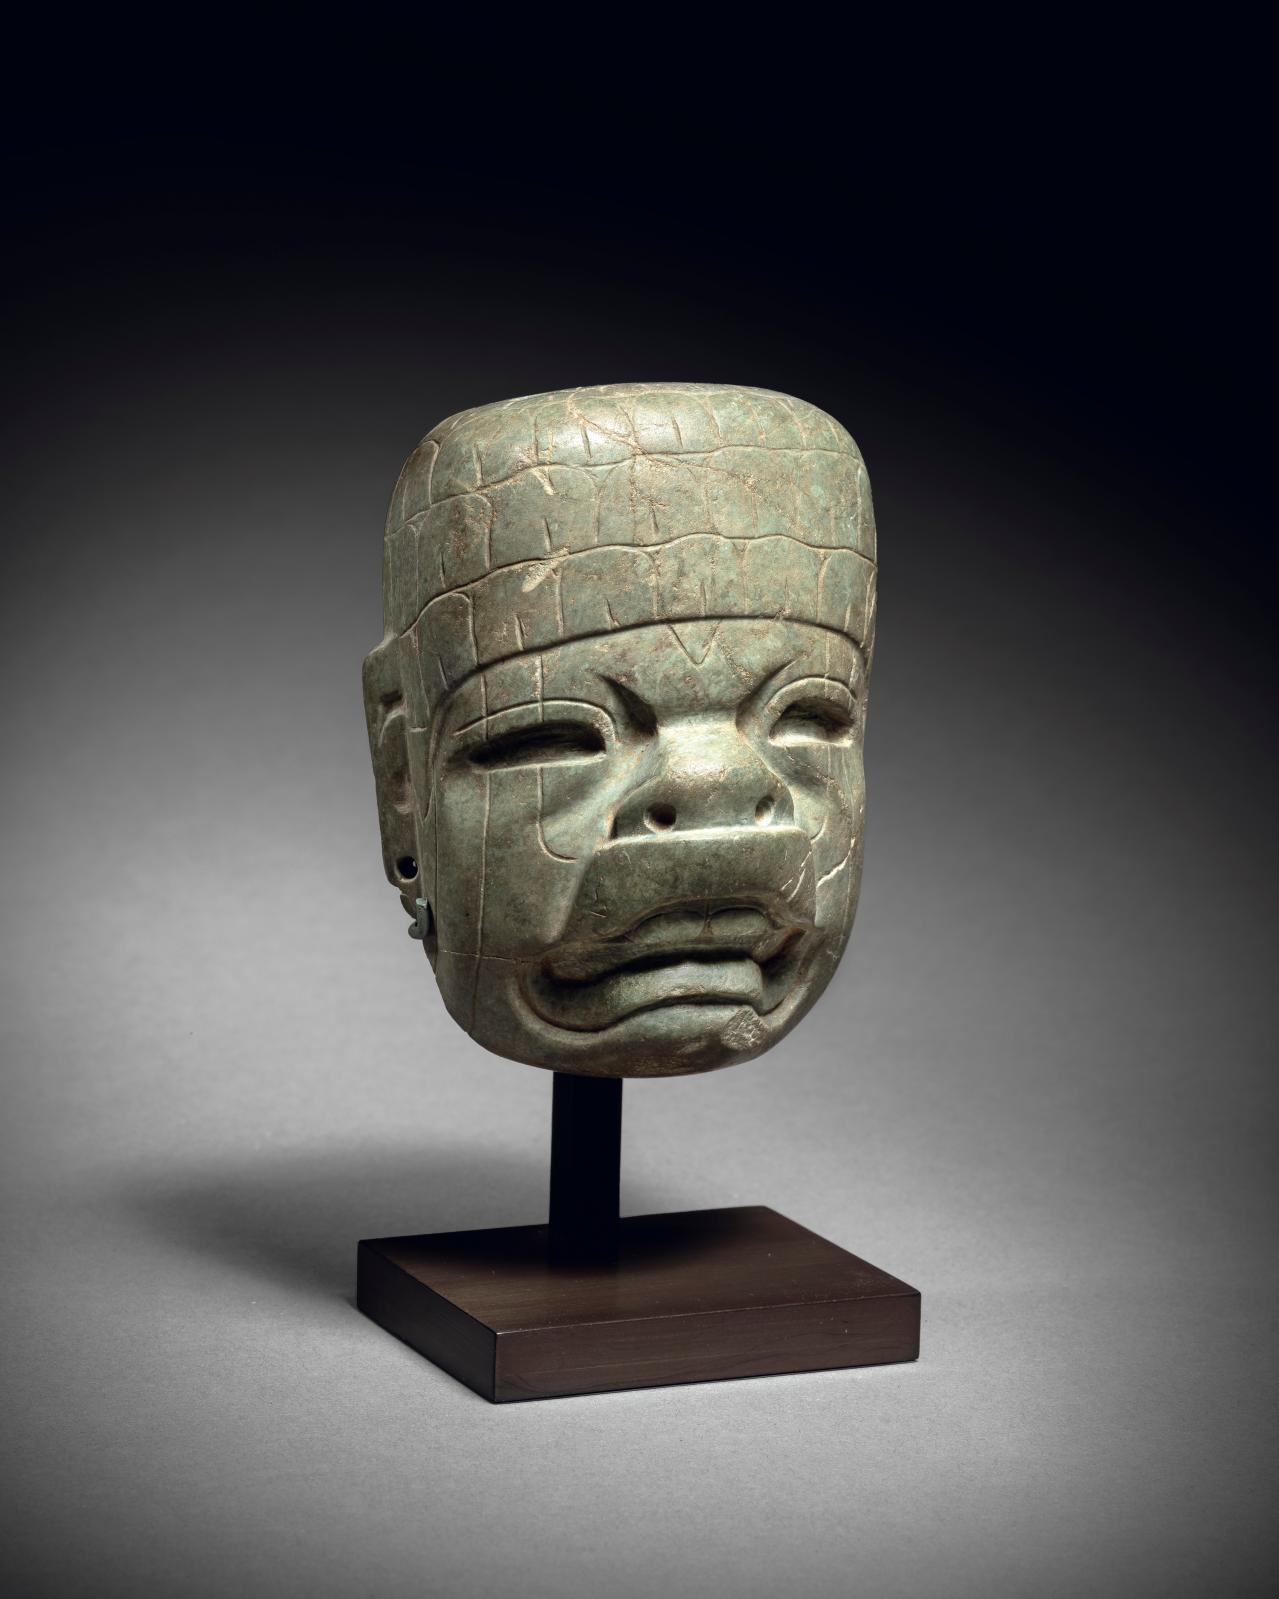 Olmec culture, Middle Pre-classic Mexico, 900-400 BC, small mask depicting a man-jaguar, green stone, h. 10 cm.Estimate: €50,000/60,000